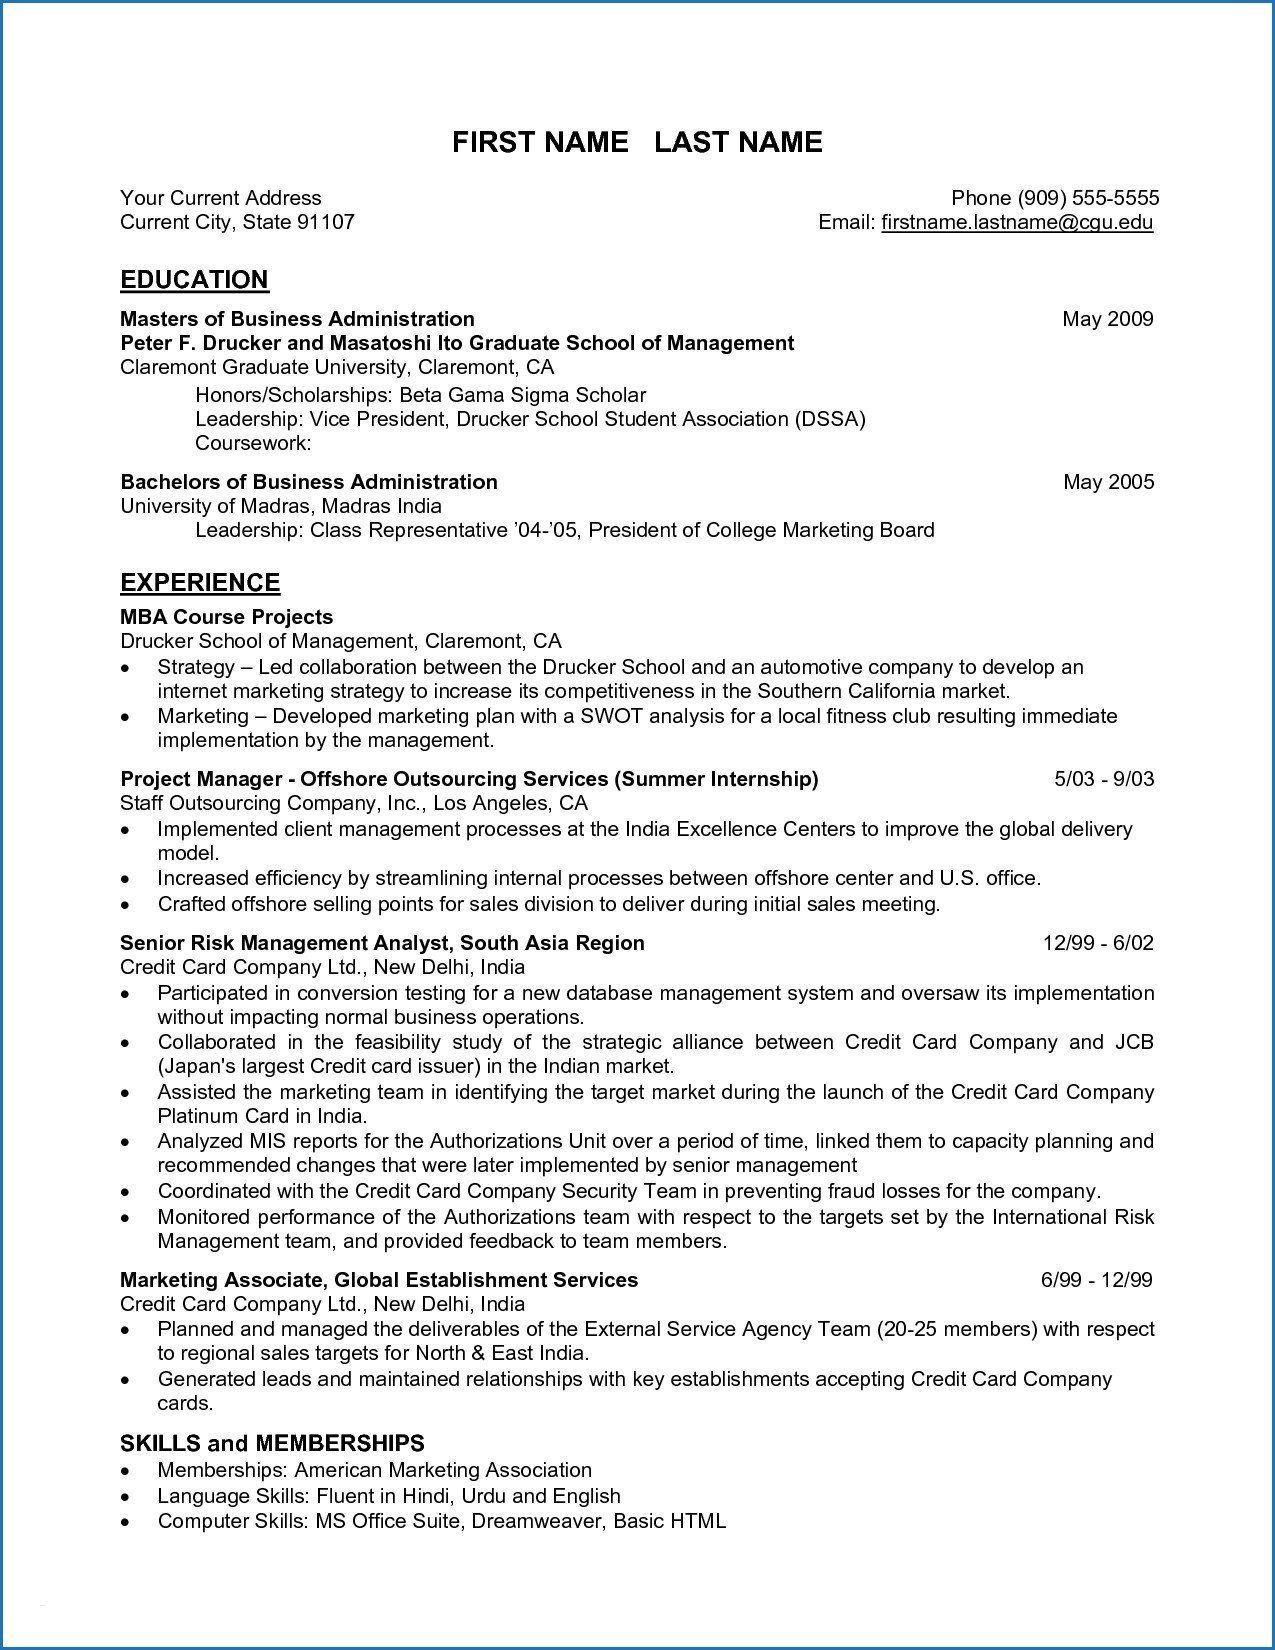 004 Remarkable Grad School Resume Template Free Photo Full